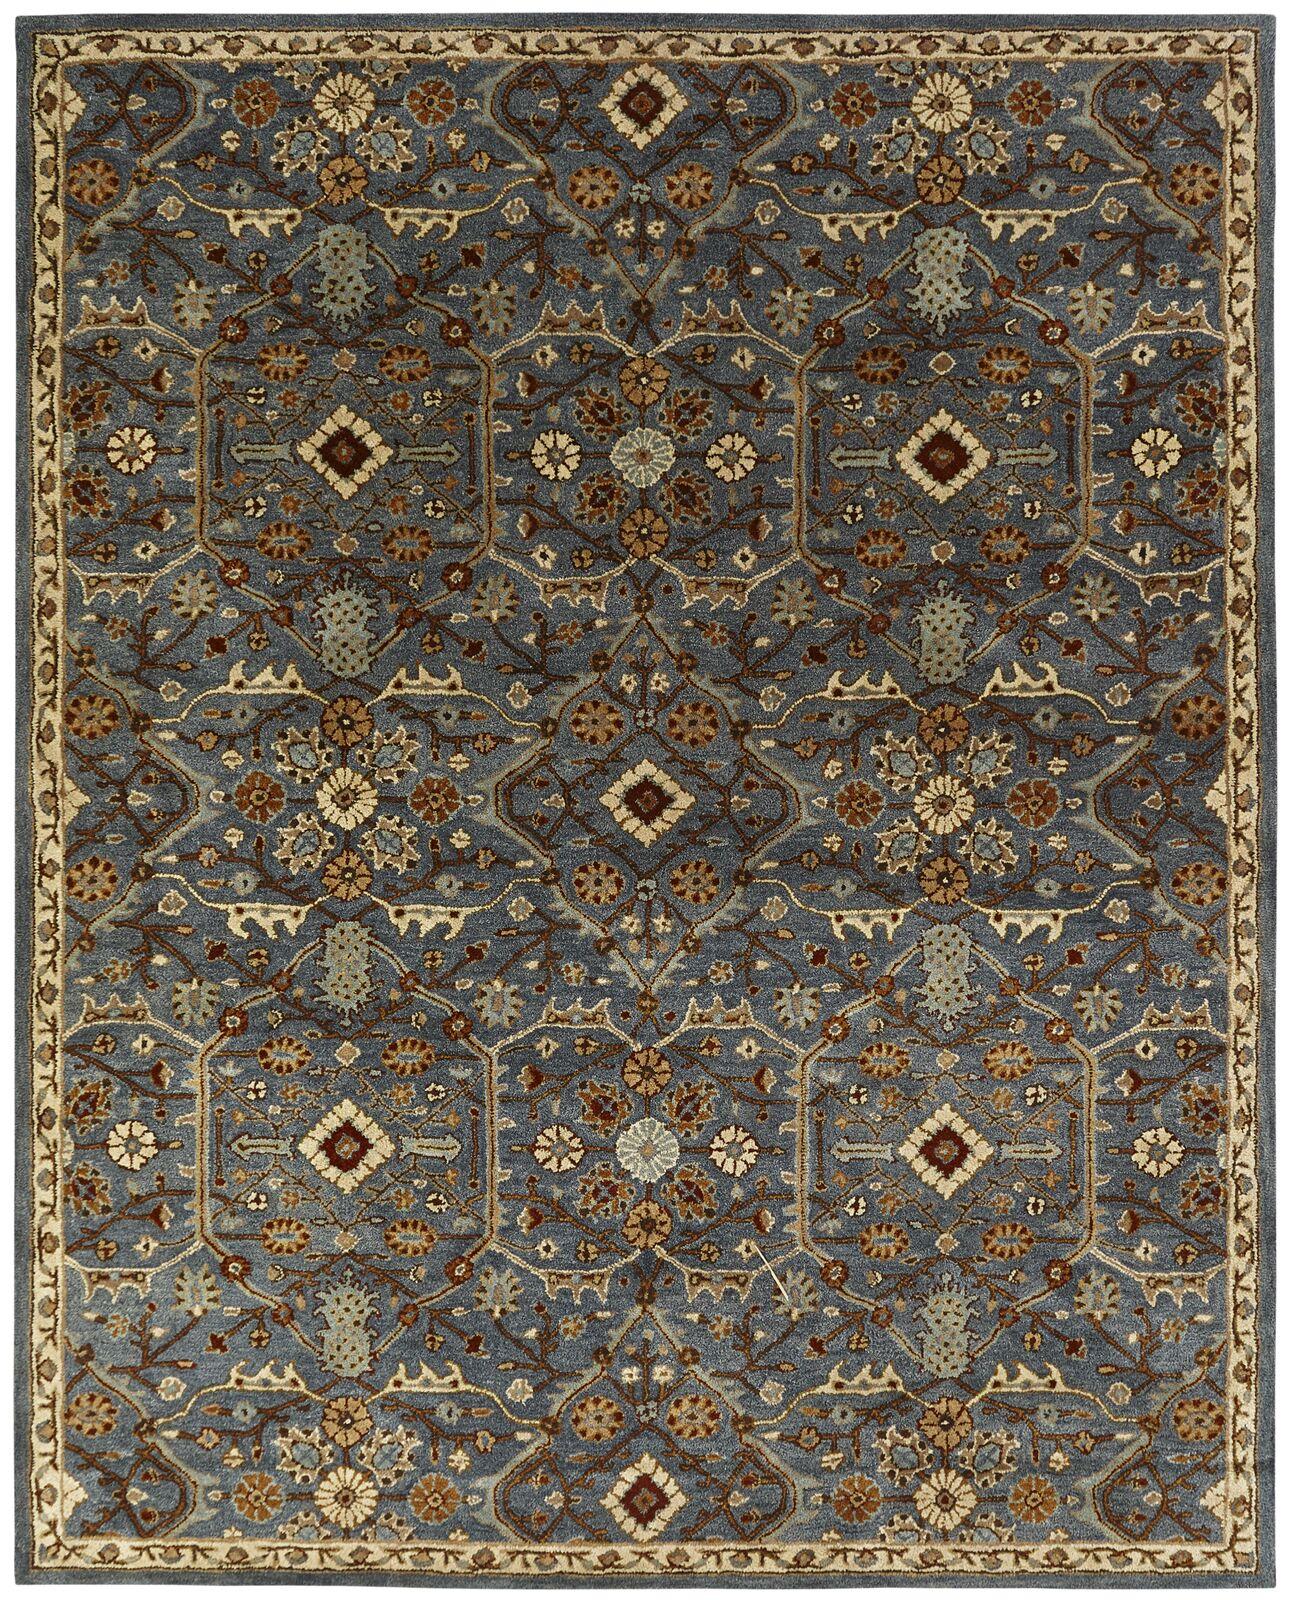 Chana Hand-Woven Blue/Brown Area Rug Rug Size: Rectangle 3'6